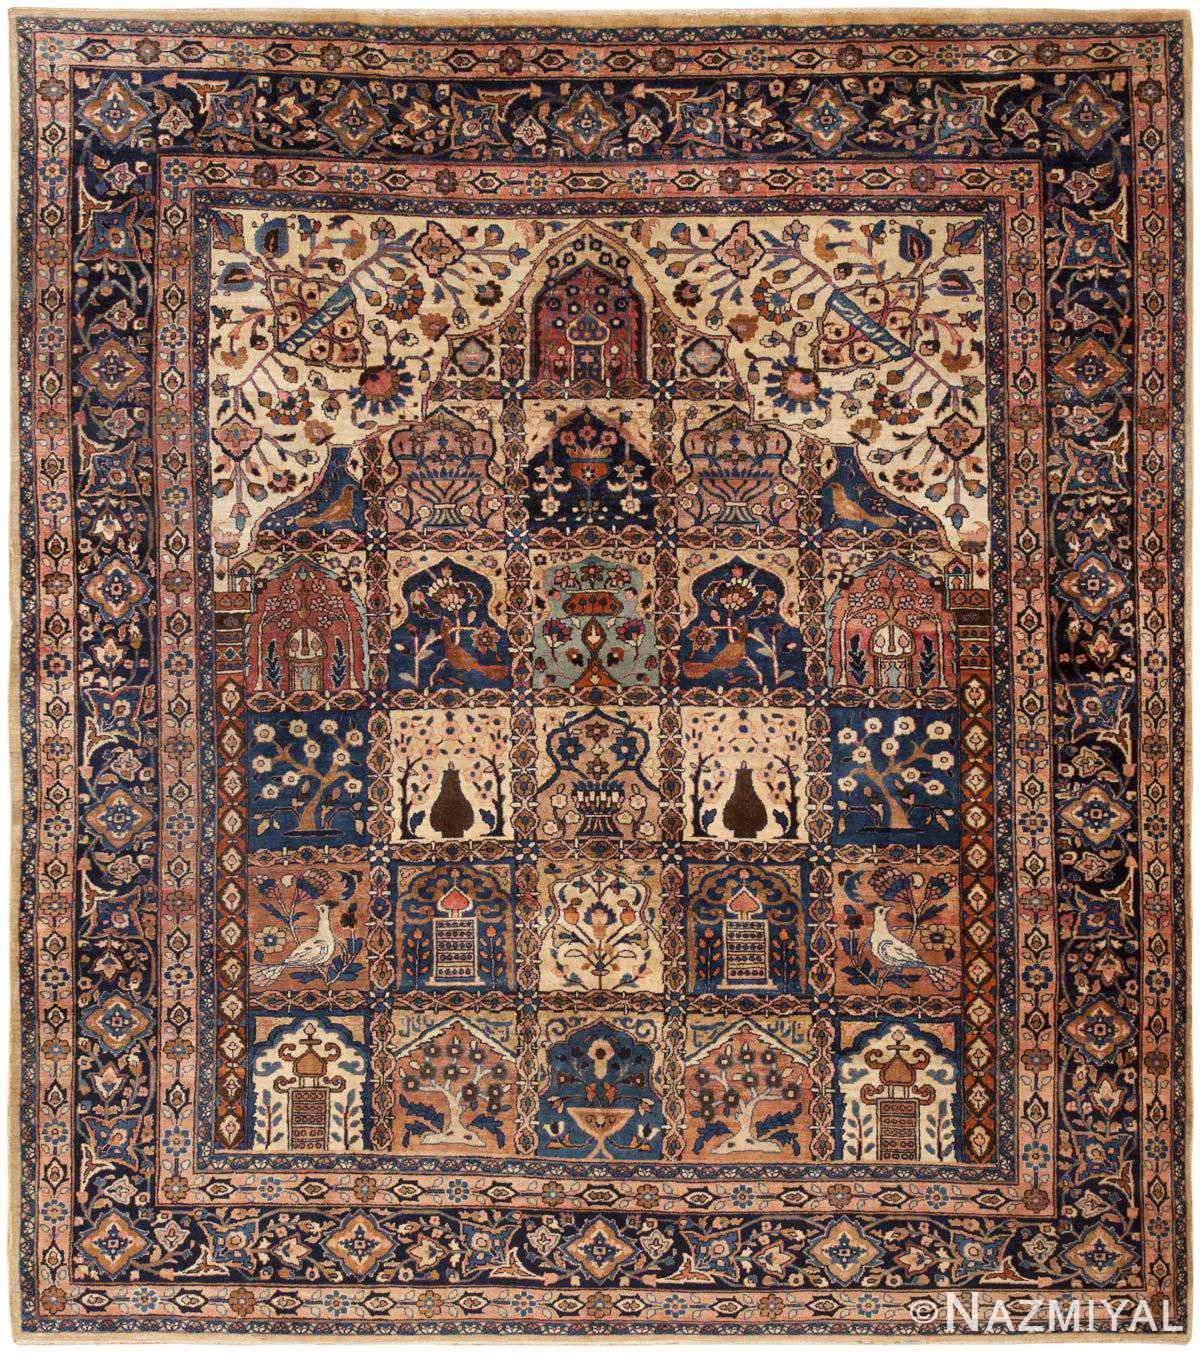 Antique Persian Khorassan Rug 46362 Large Image